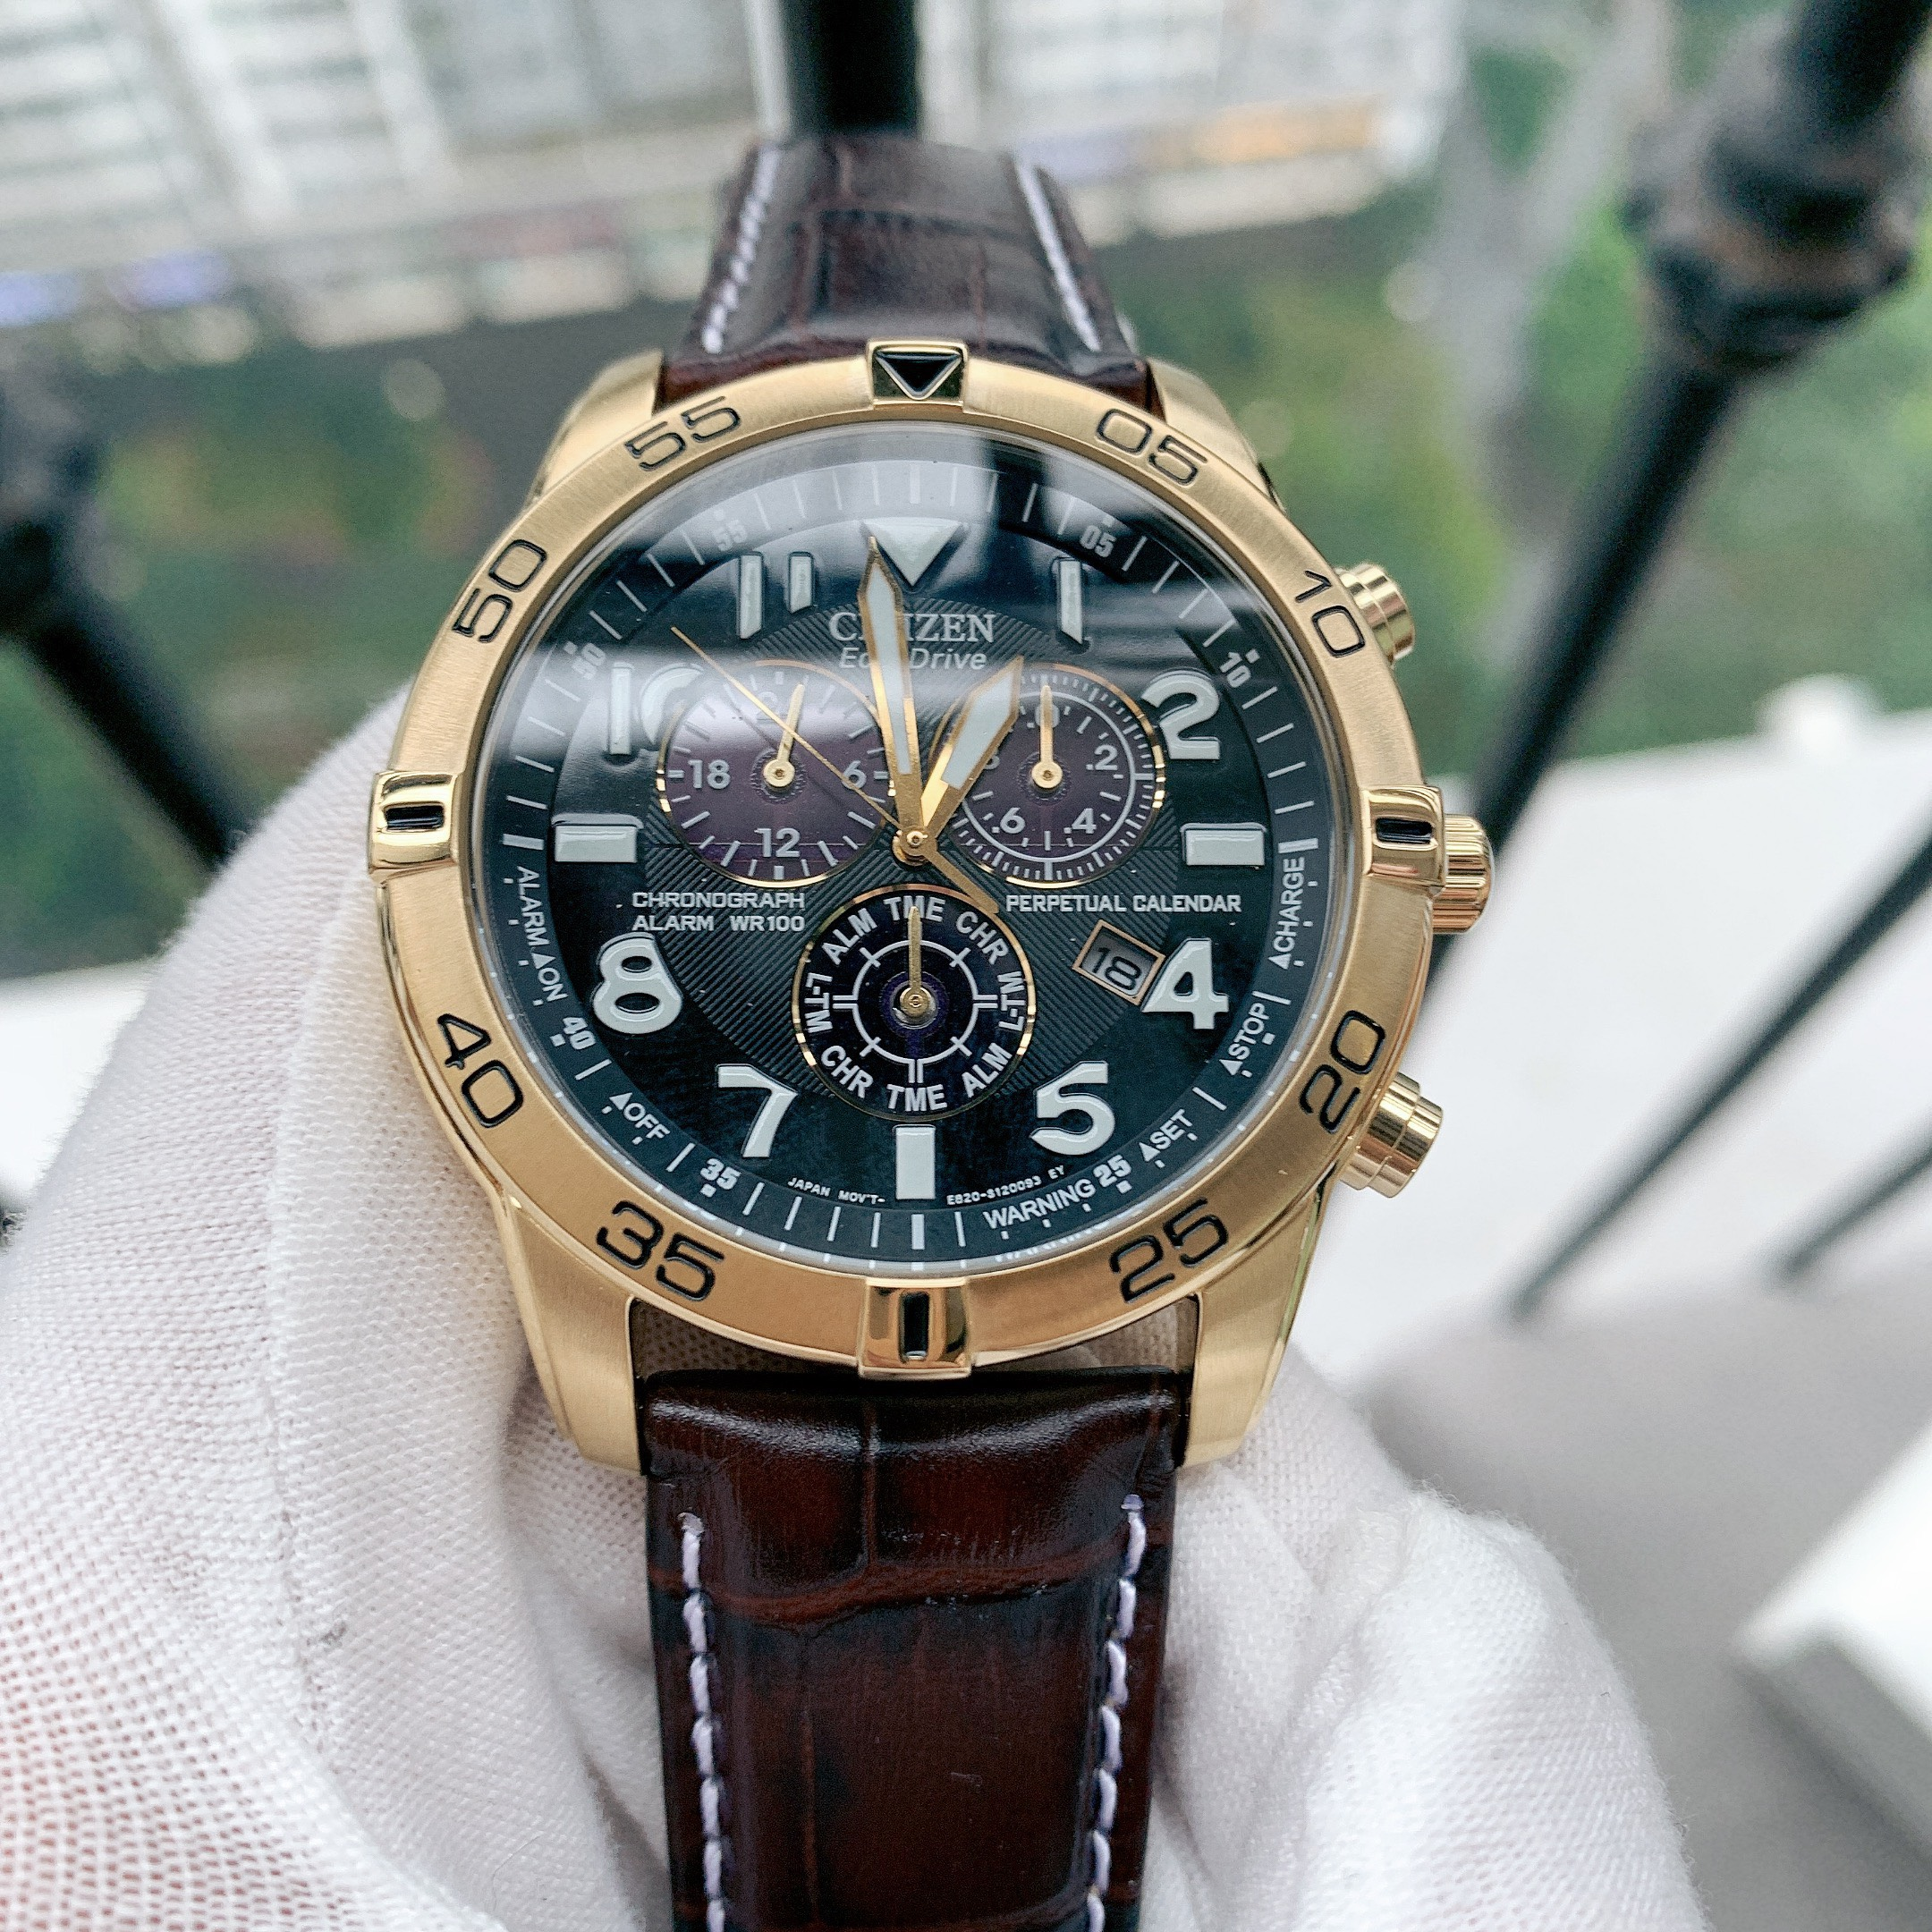 Đồng hồ nữ chính hãng Citizen Eco-Drive Perpetual Calendar Chronograph Alarm